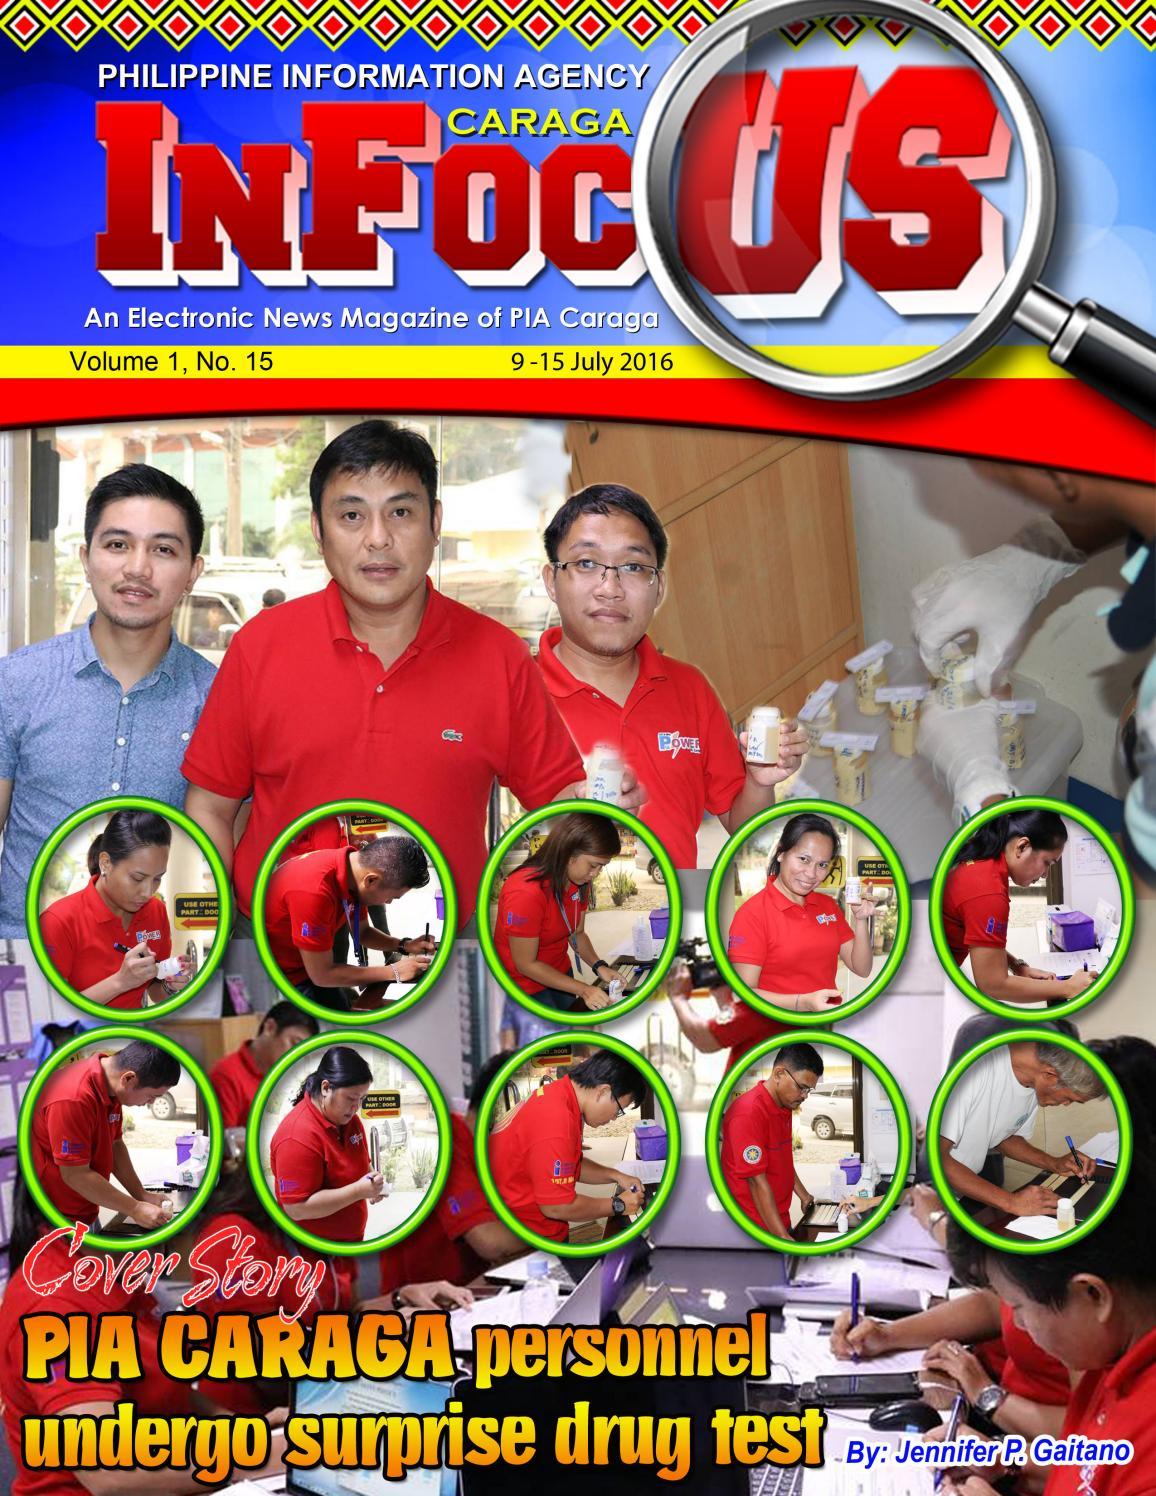 Caraga InFocus - July 9 - 15, 2016 by Caraga InFocus - issuu